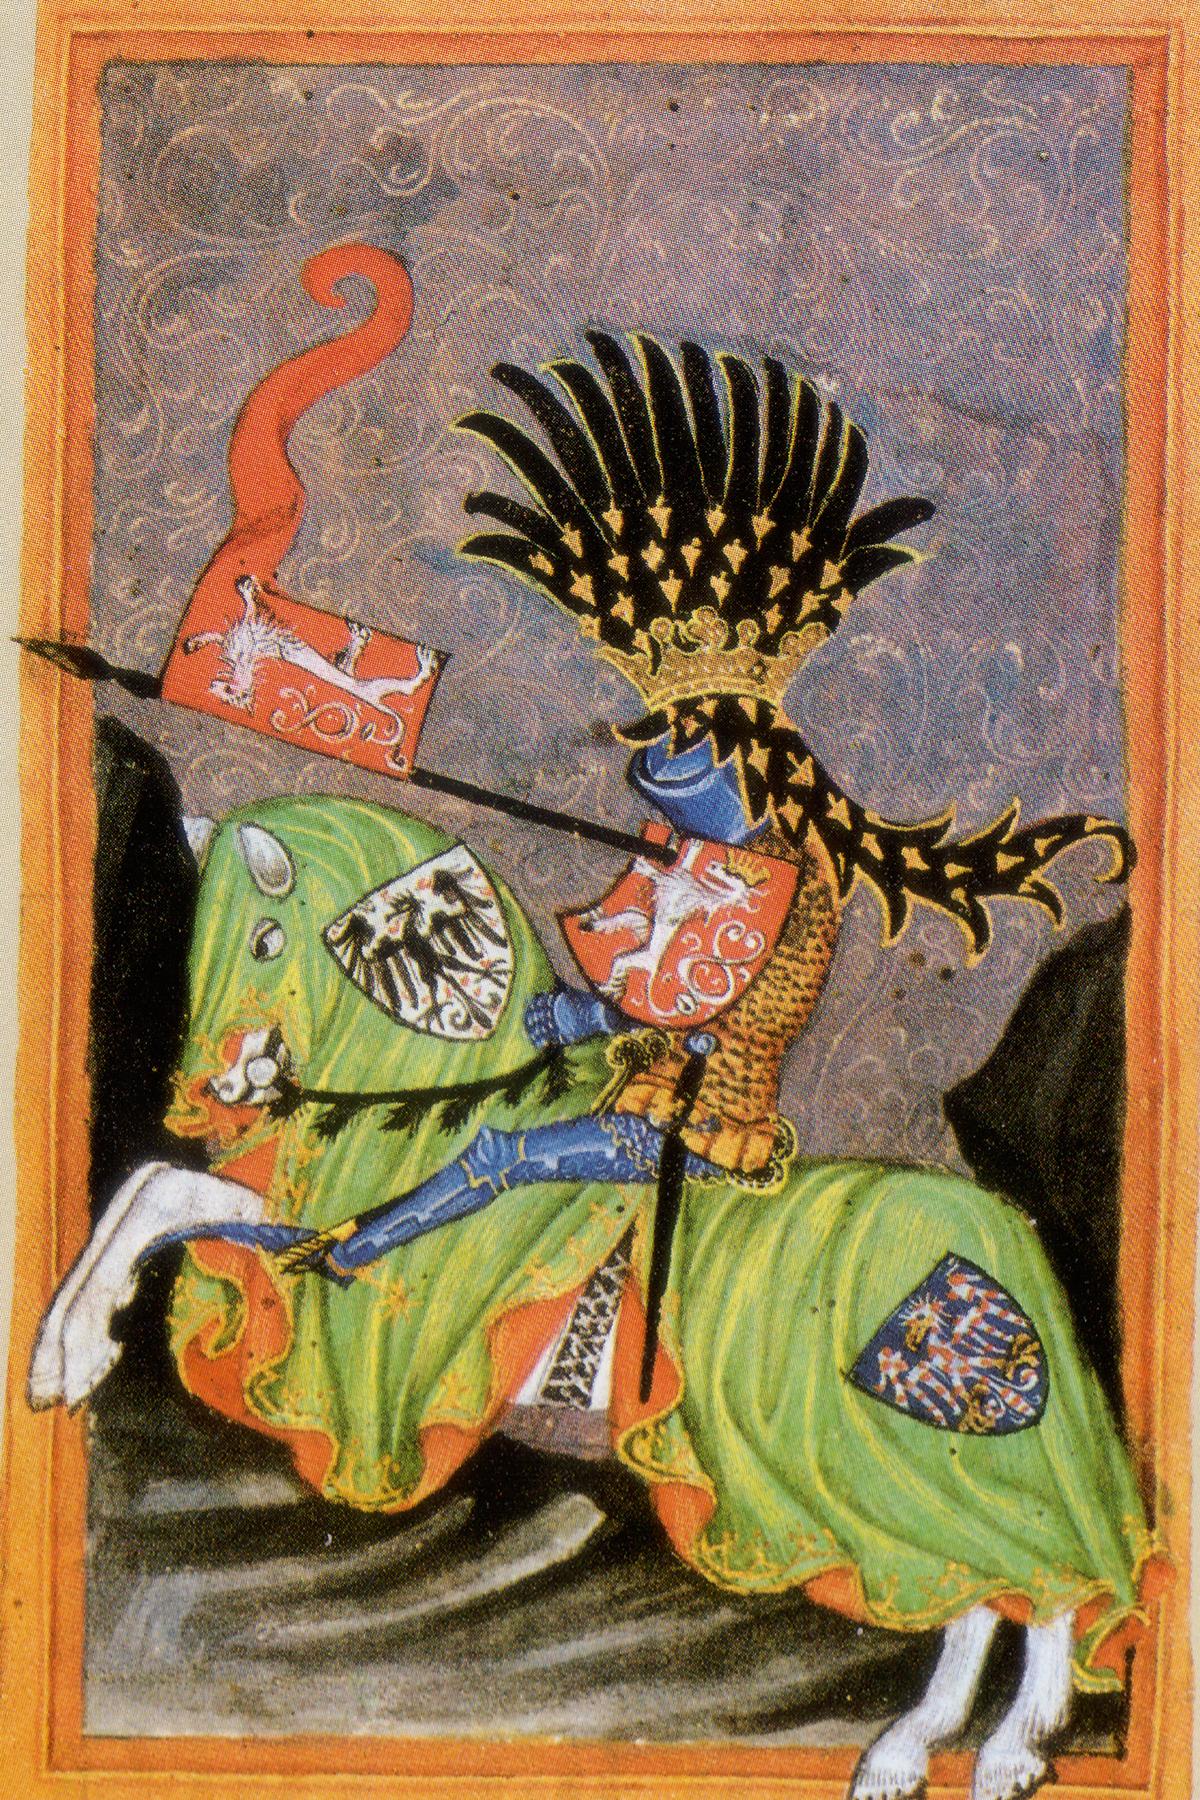 http://upload.wikimedia.org/wikipedia/commons/d/d3/VaclavGelnhausenovekodexu.jpg